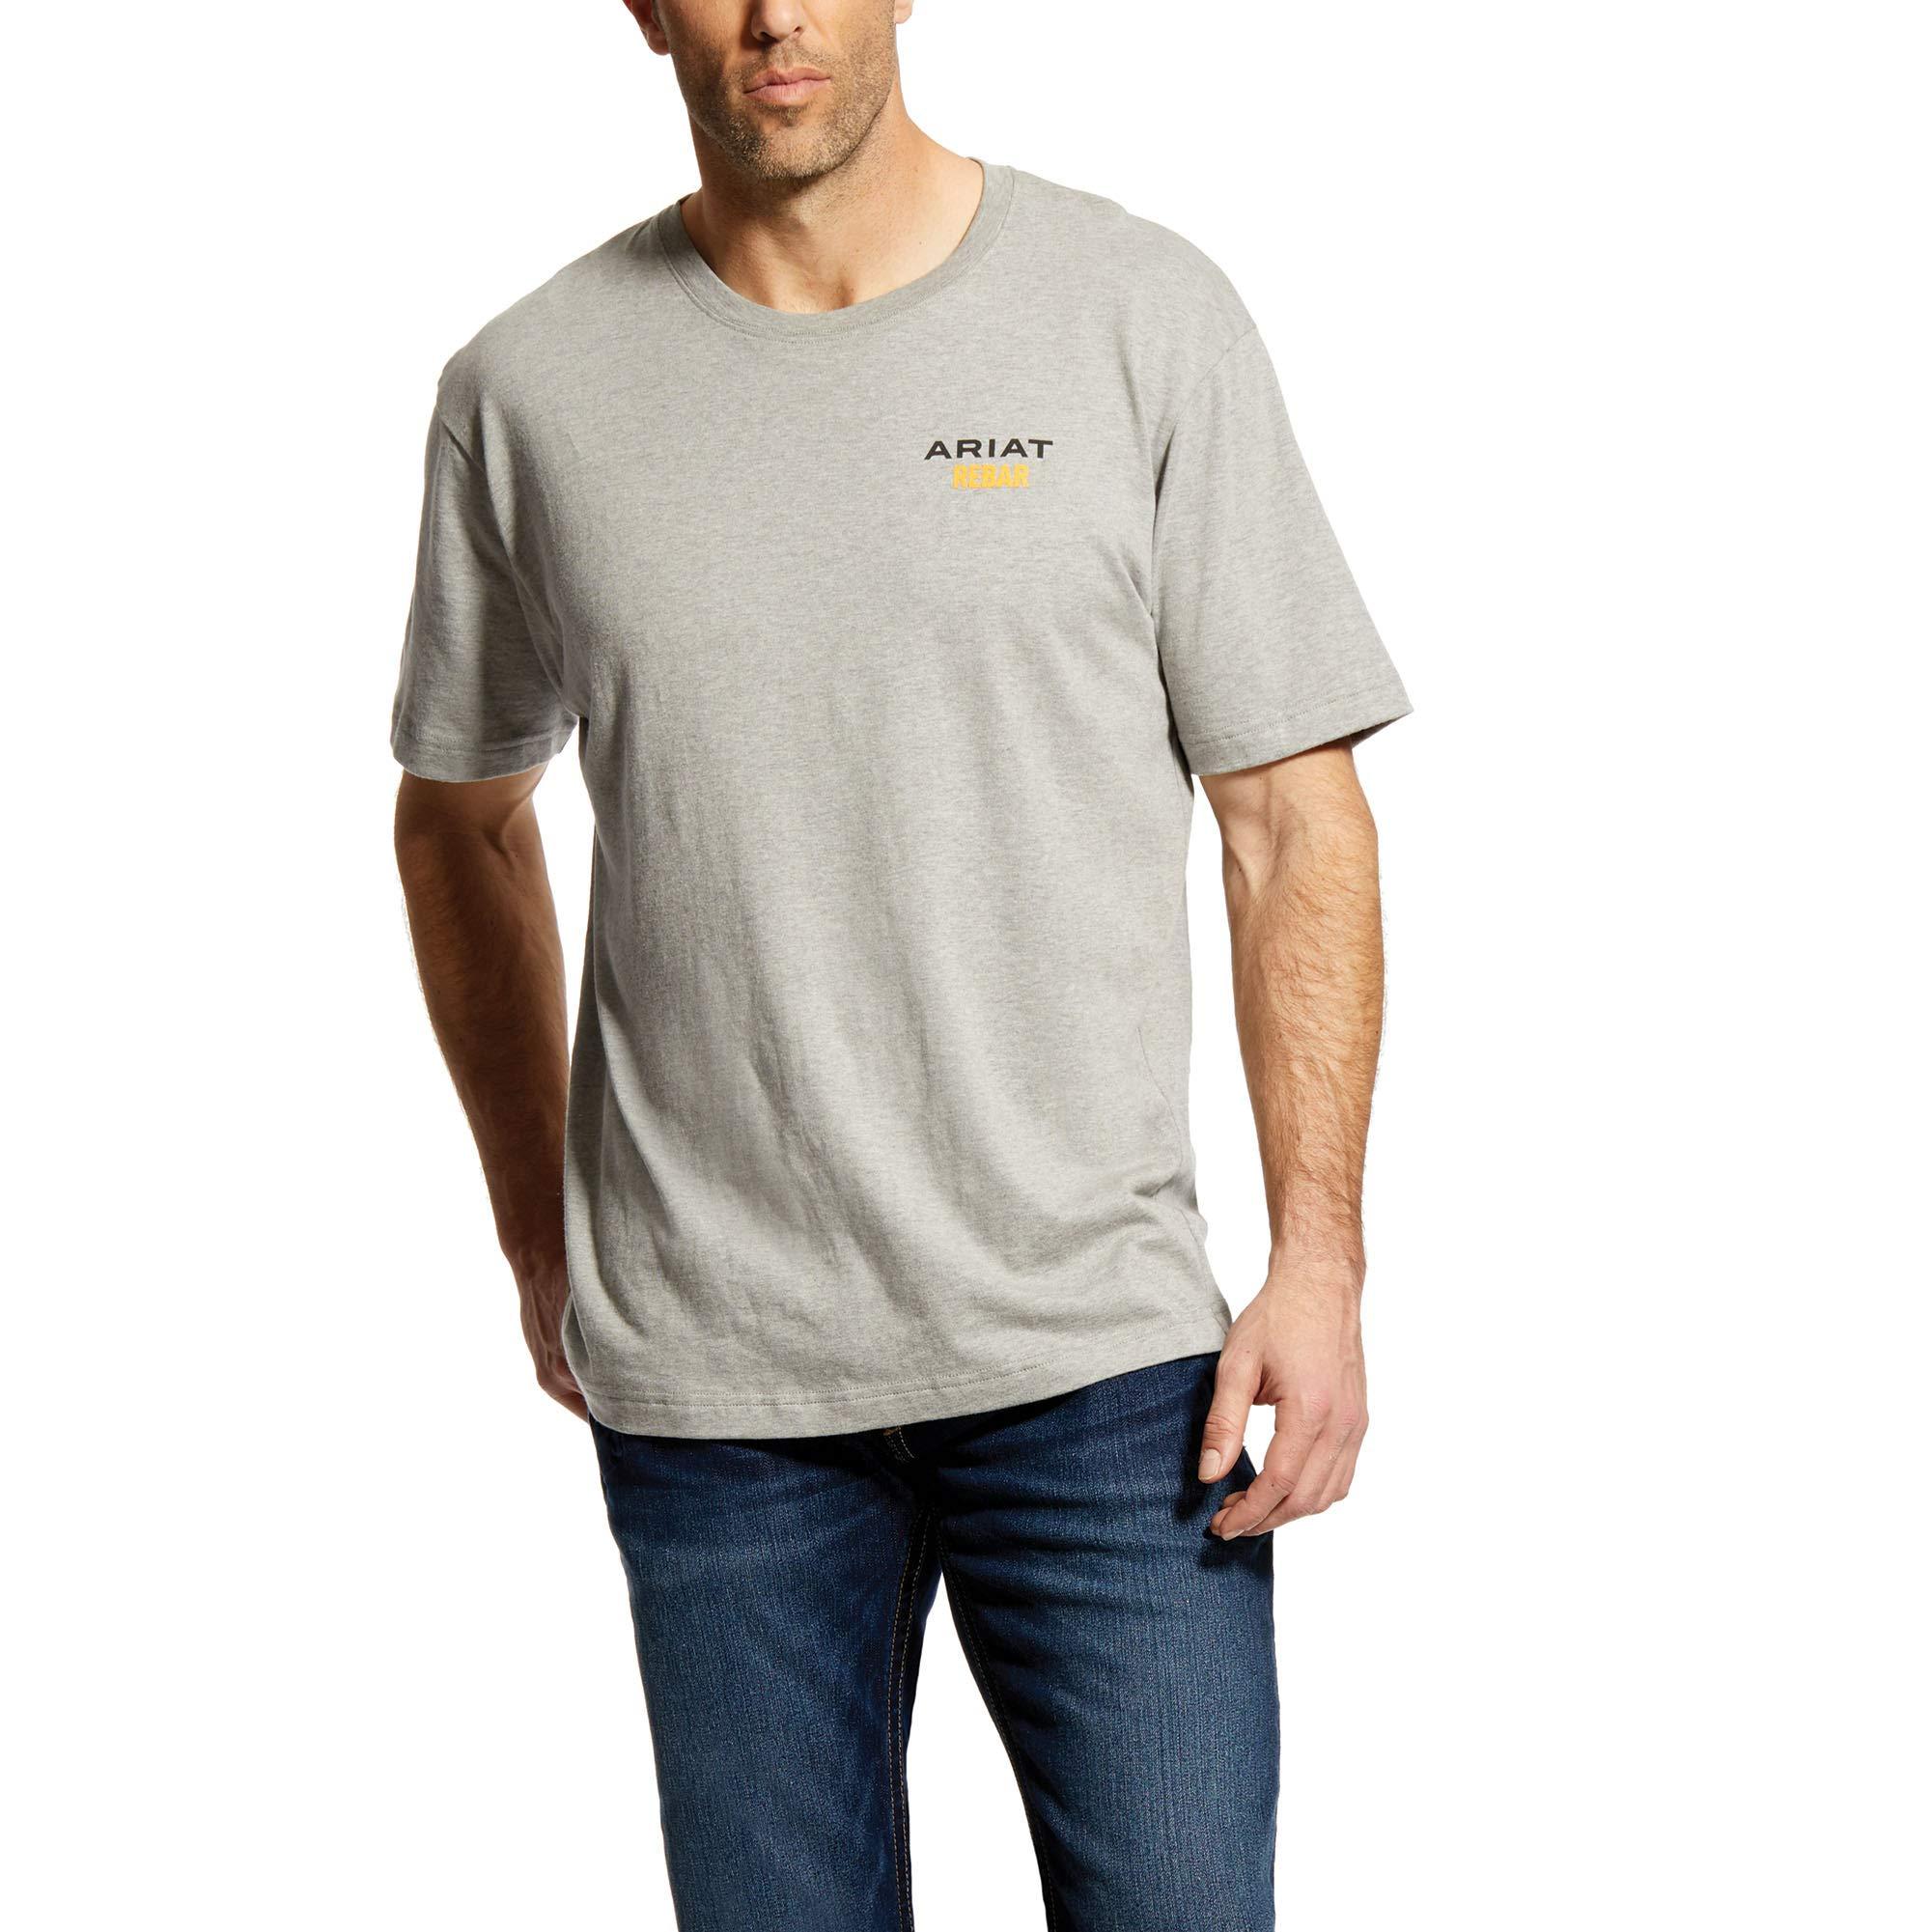 ARIAT Men's Rebar Cottonstrong Short Sleeve Logo Crewwork Utility Tee Shirt